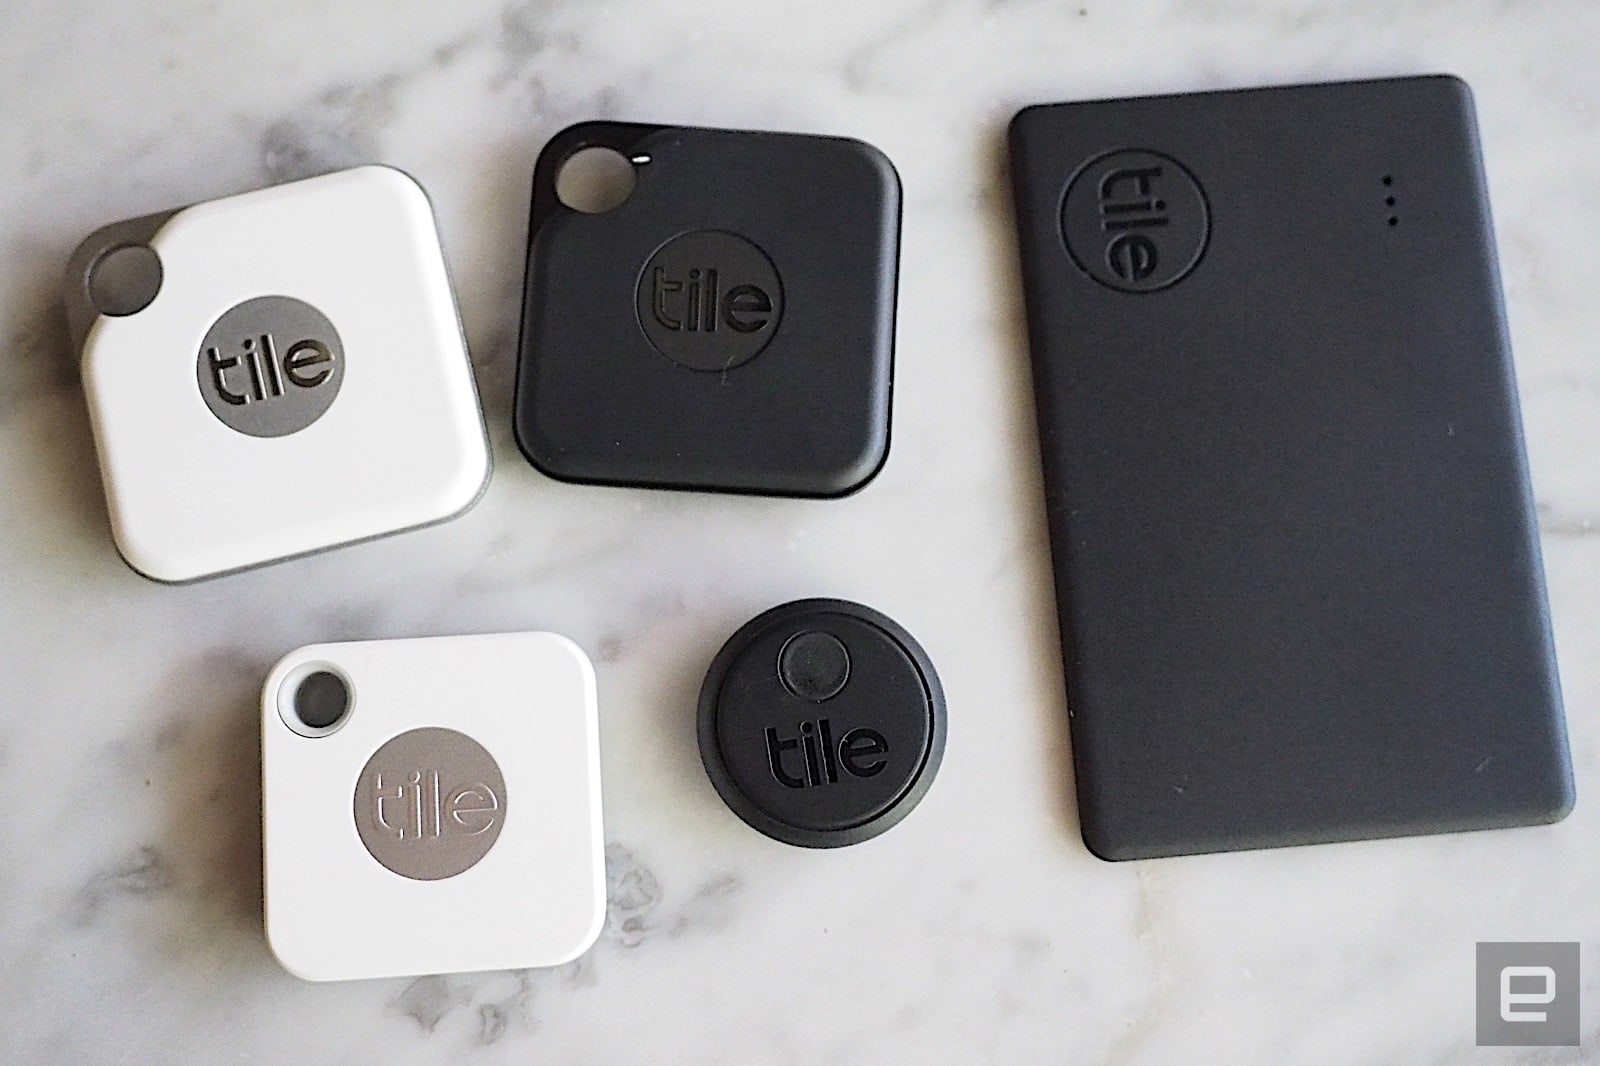 Bluetooth Tracker Is A Tiny